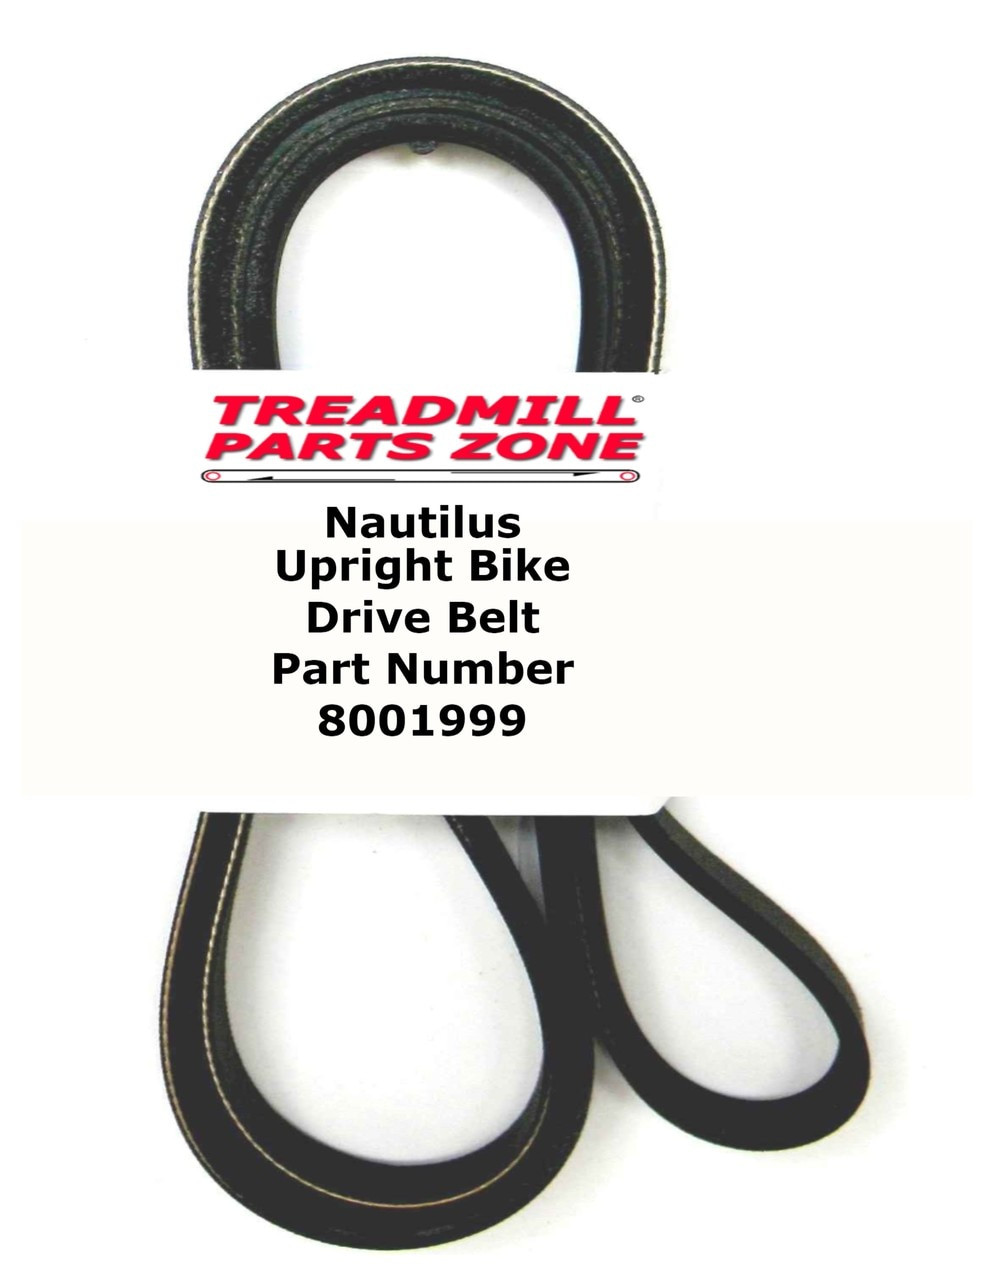 Nautilus Upright Bike Model U618 Drive Belt Part Number 8001999